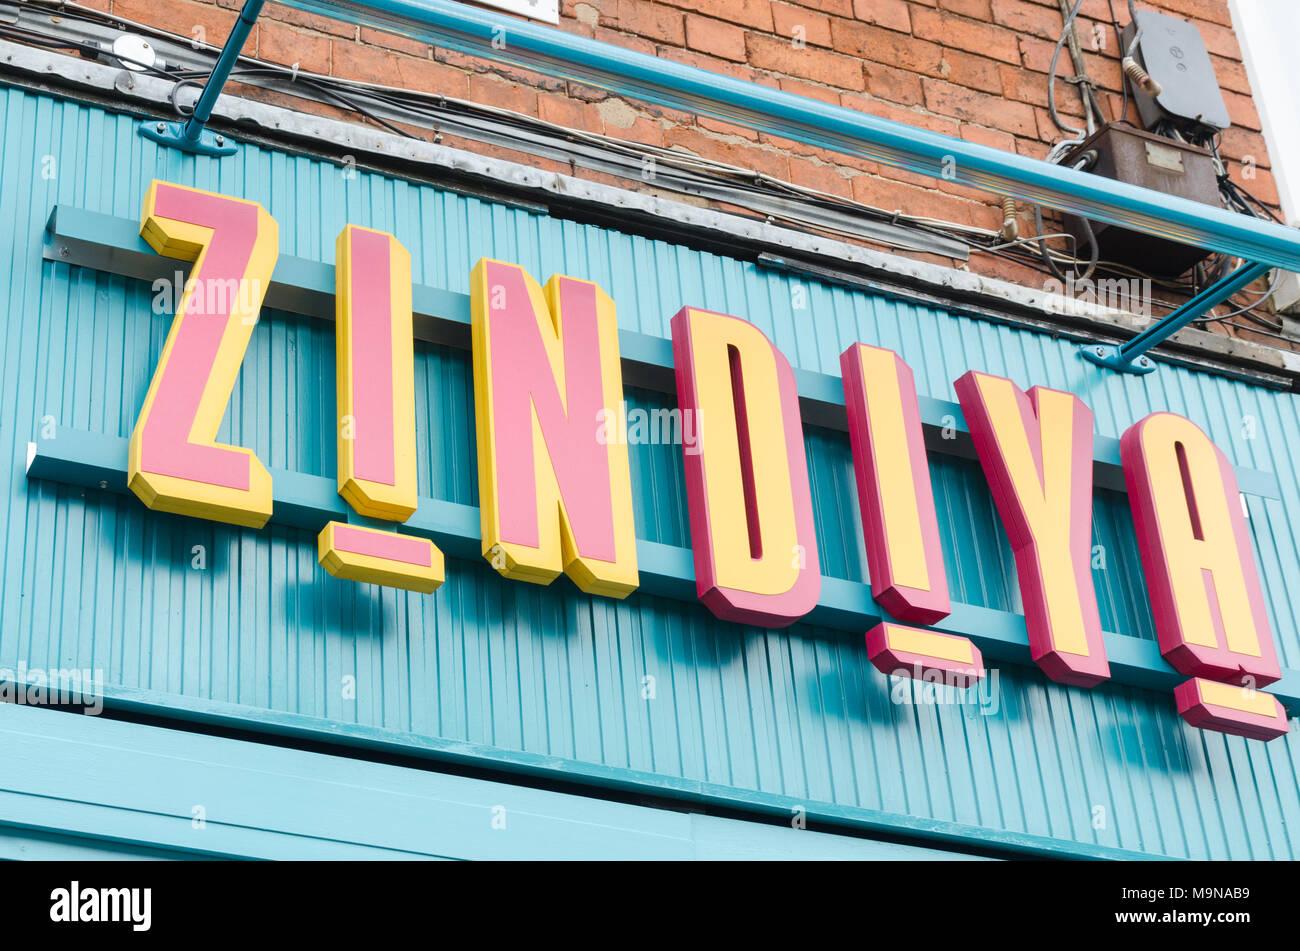 Zindiya Streatery And Bar Indian Street Food Restaurant In